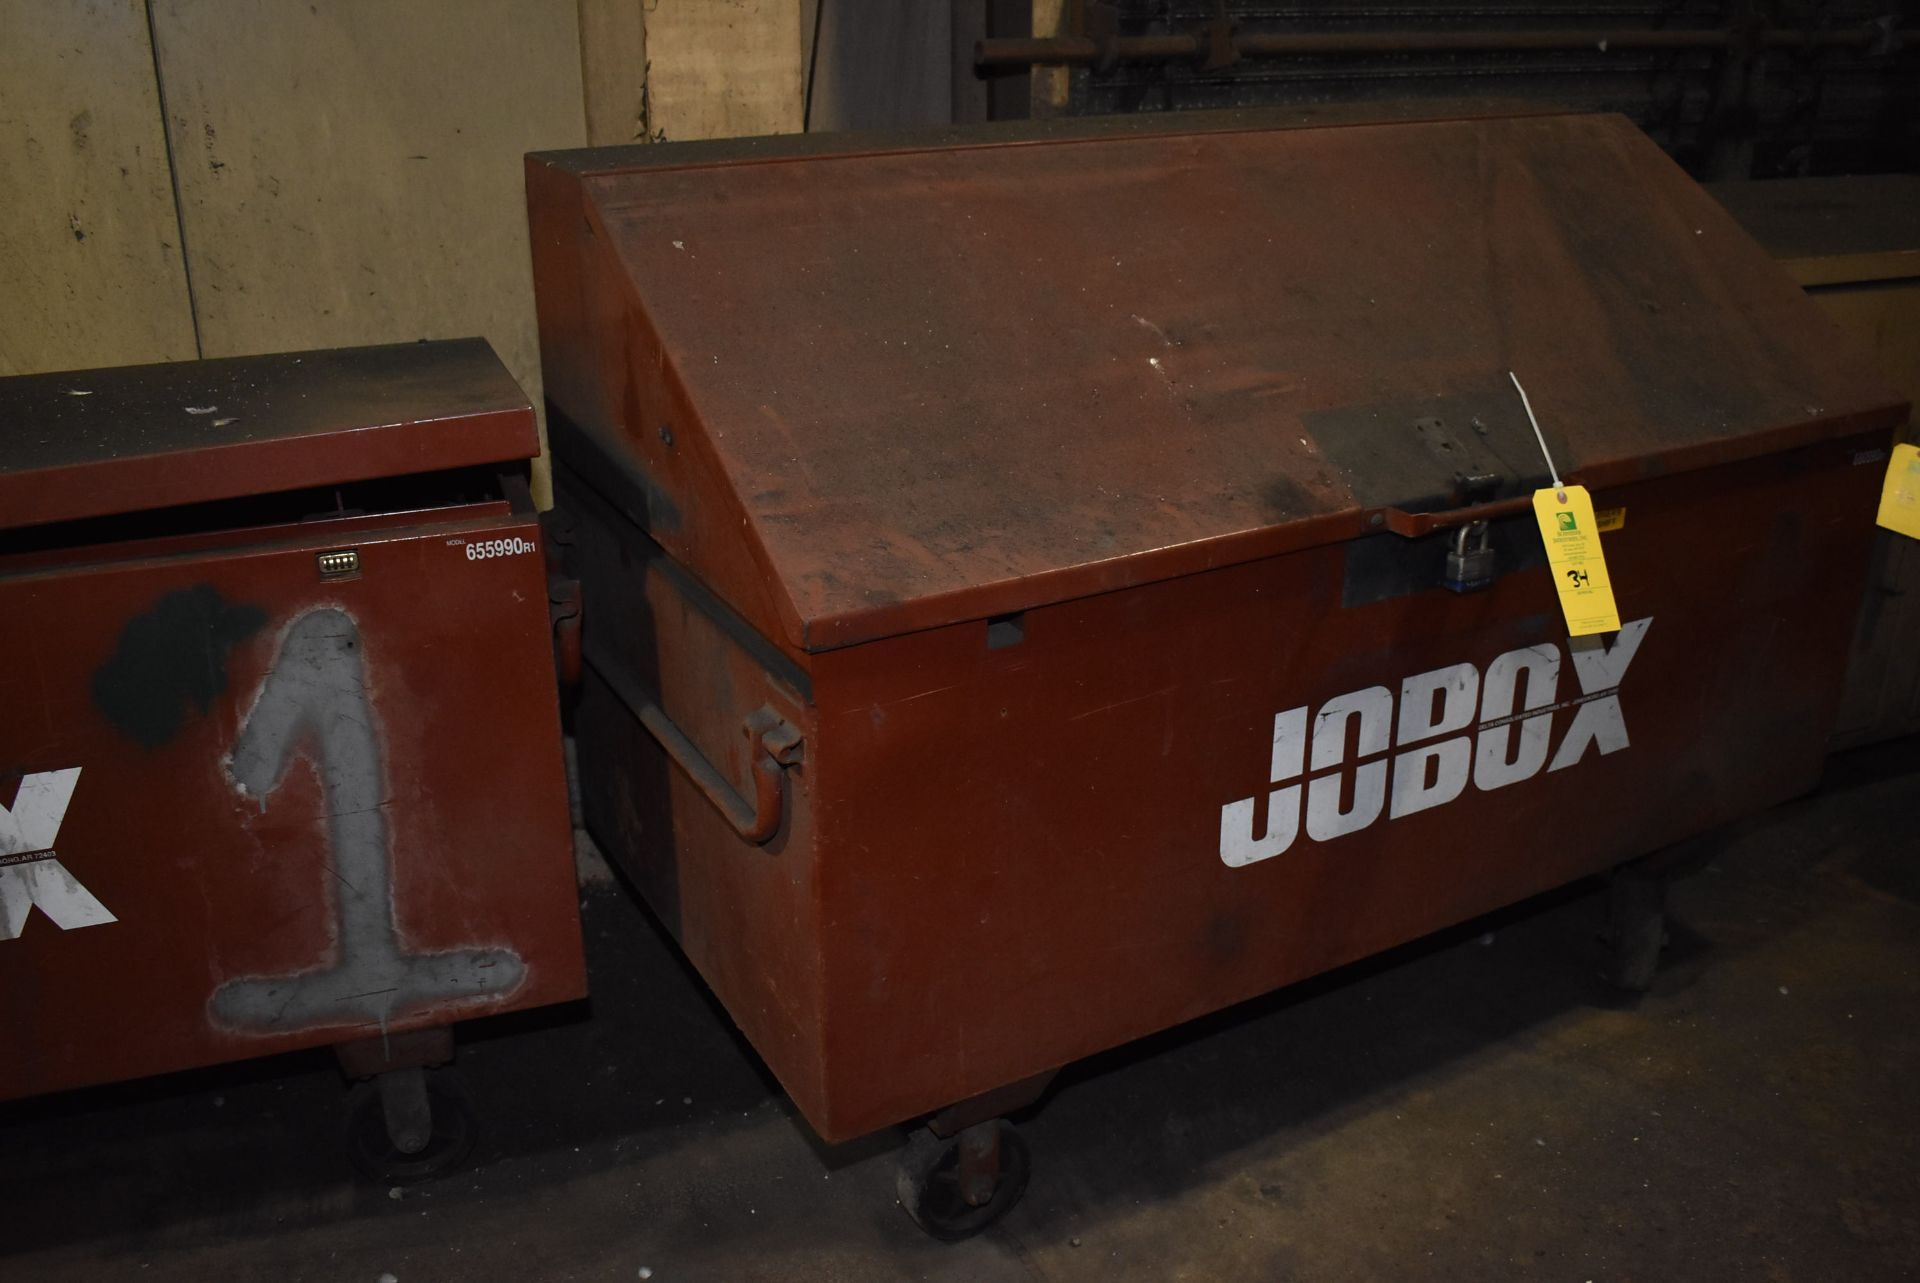 Lot 34 - Job Box Model 6559ORI, 4-Wheel Base